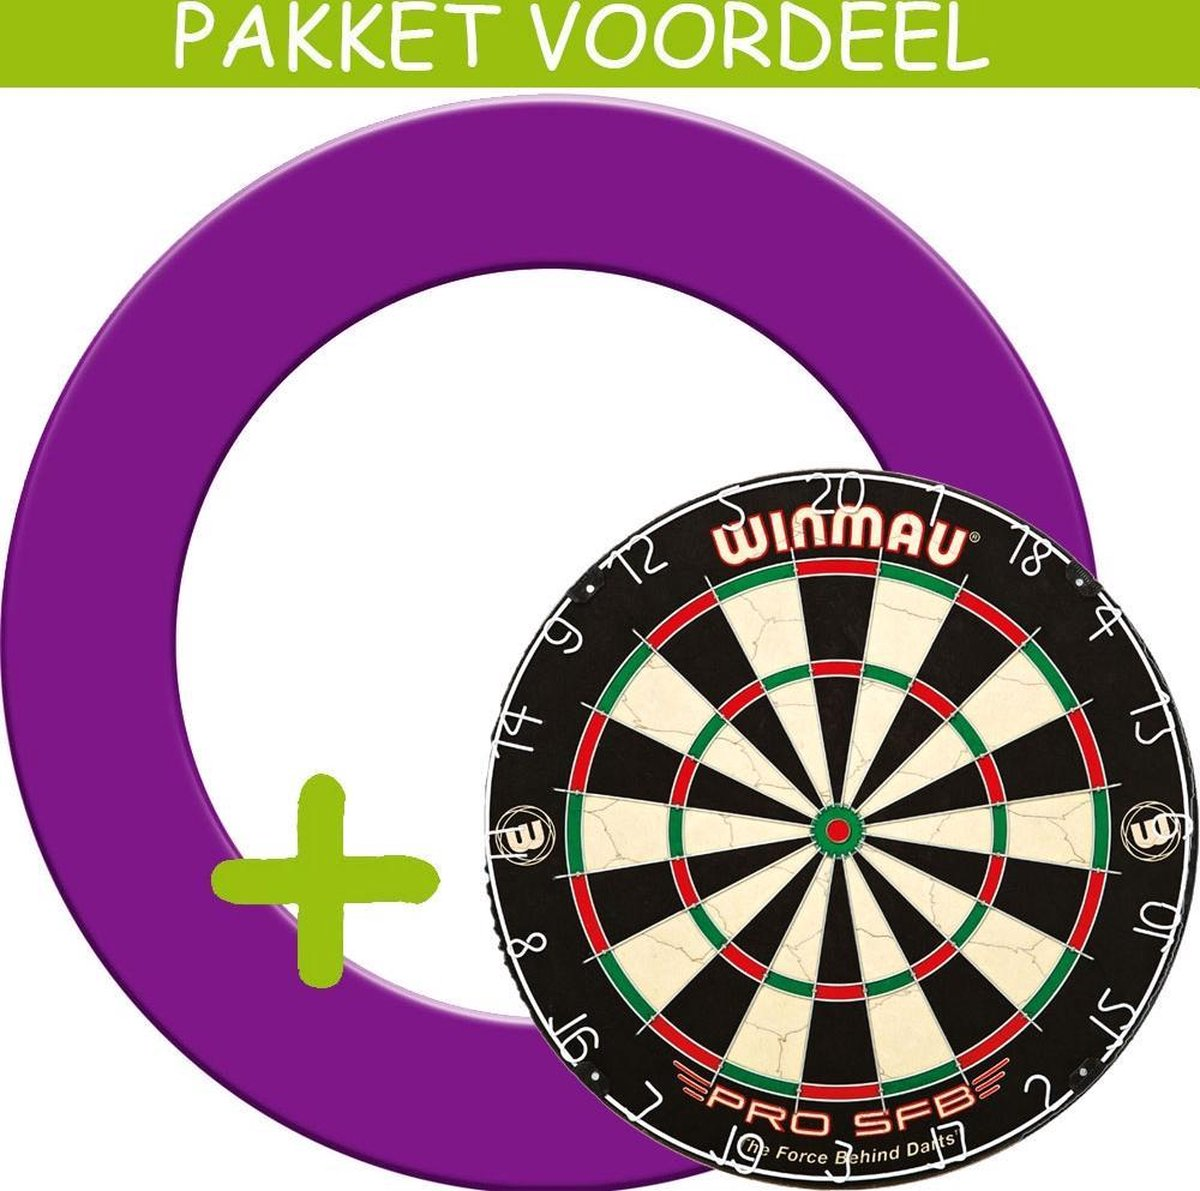 Dartbord Surround VoordeelPakket - Pro SFB - Rubberen Surround-- (Paars)